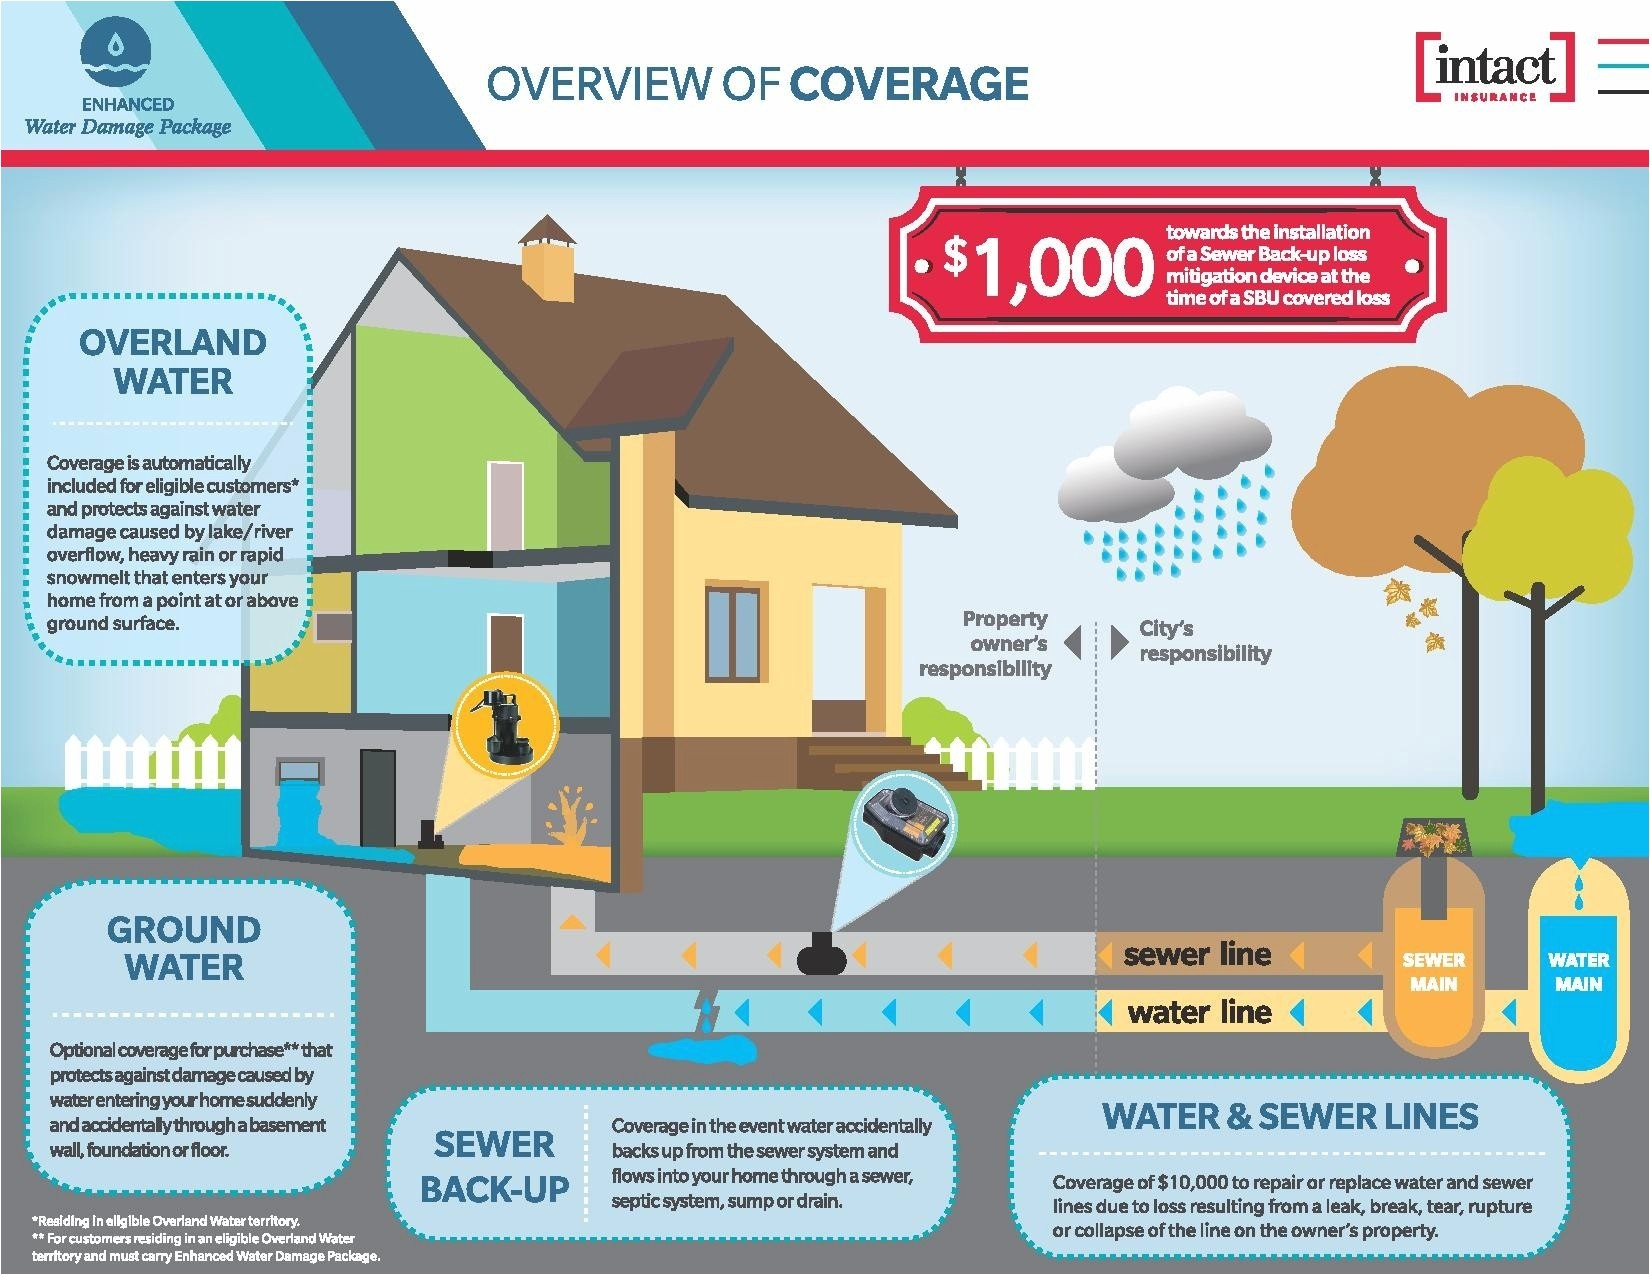 american home shield plans precious home insurance first american home buyers appliance insurance